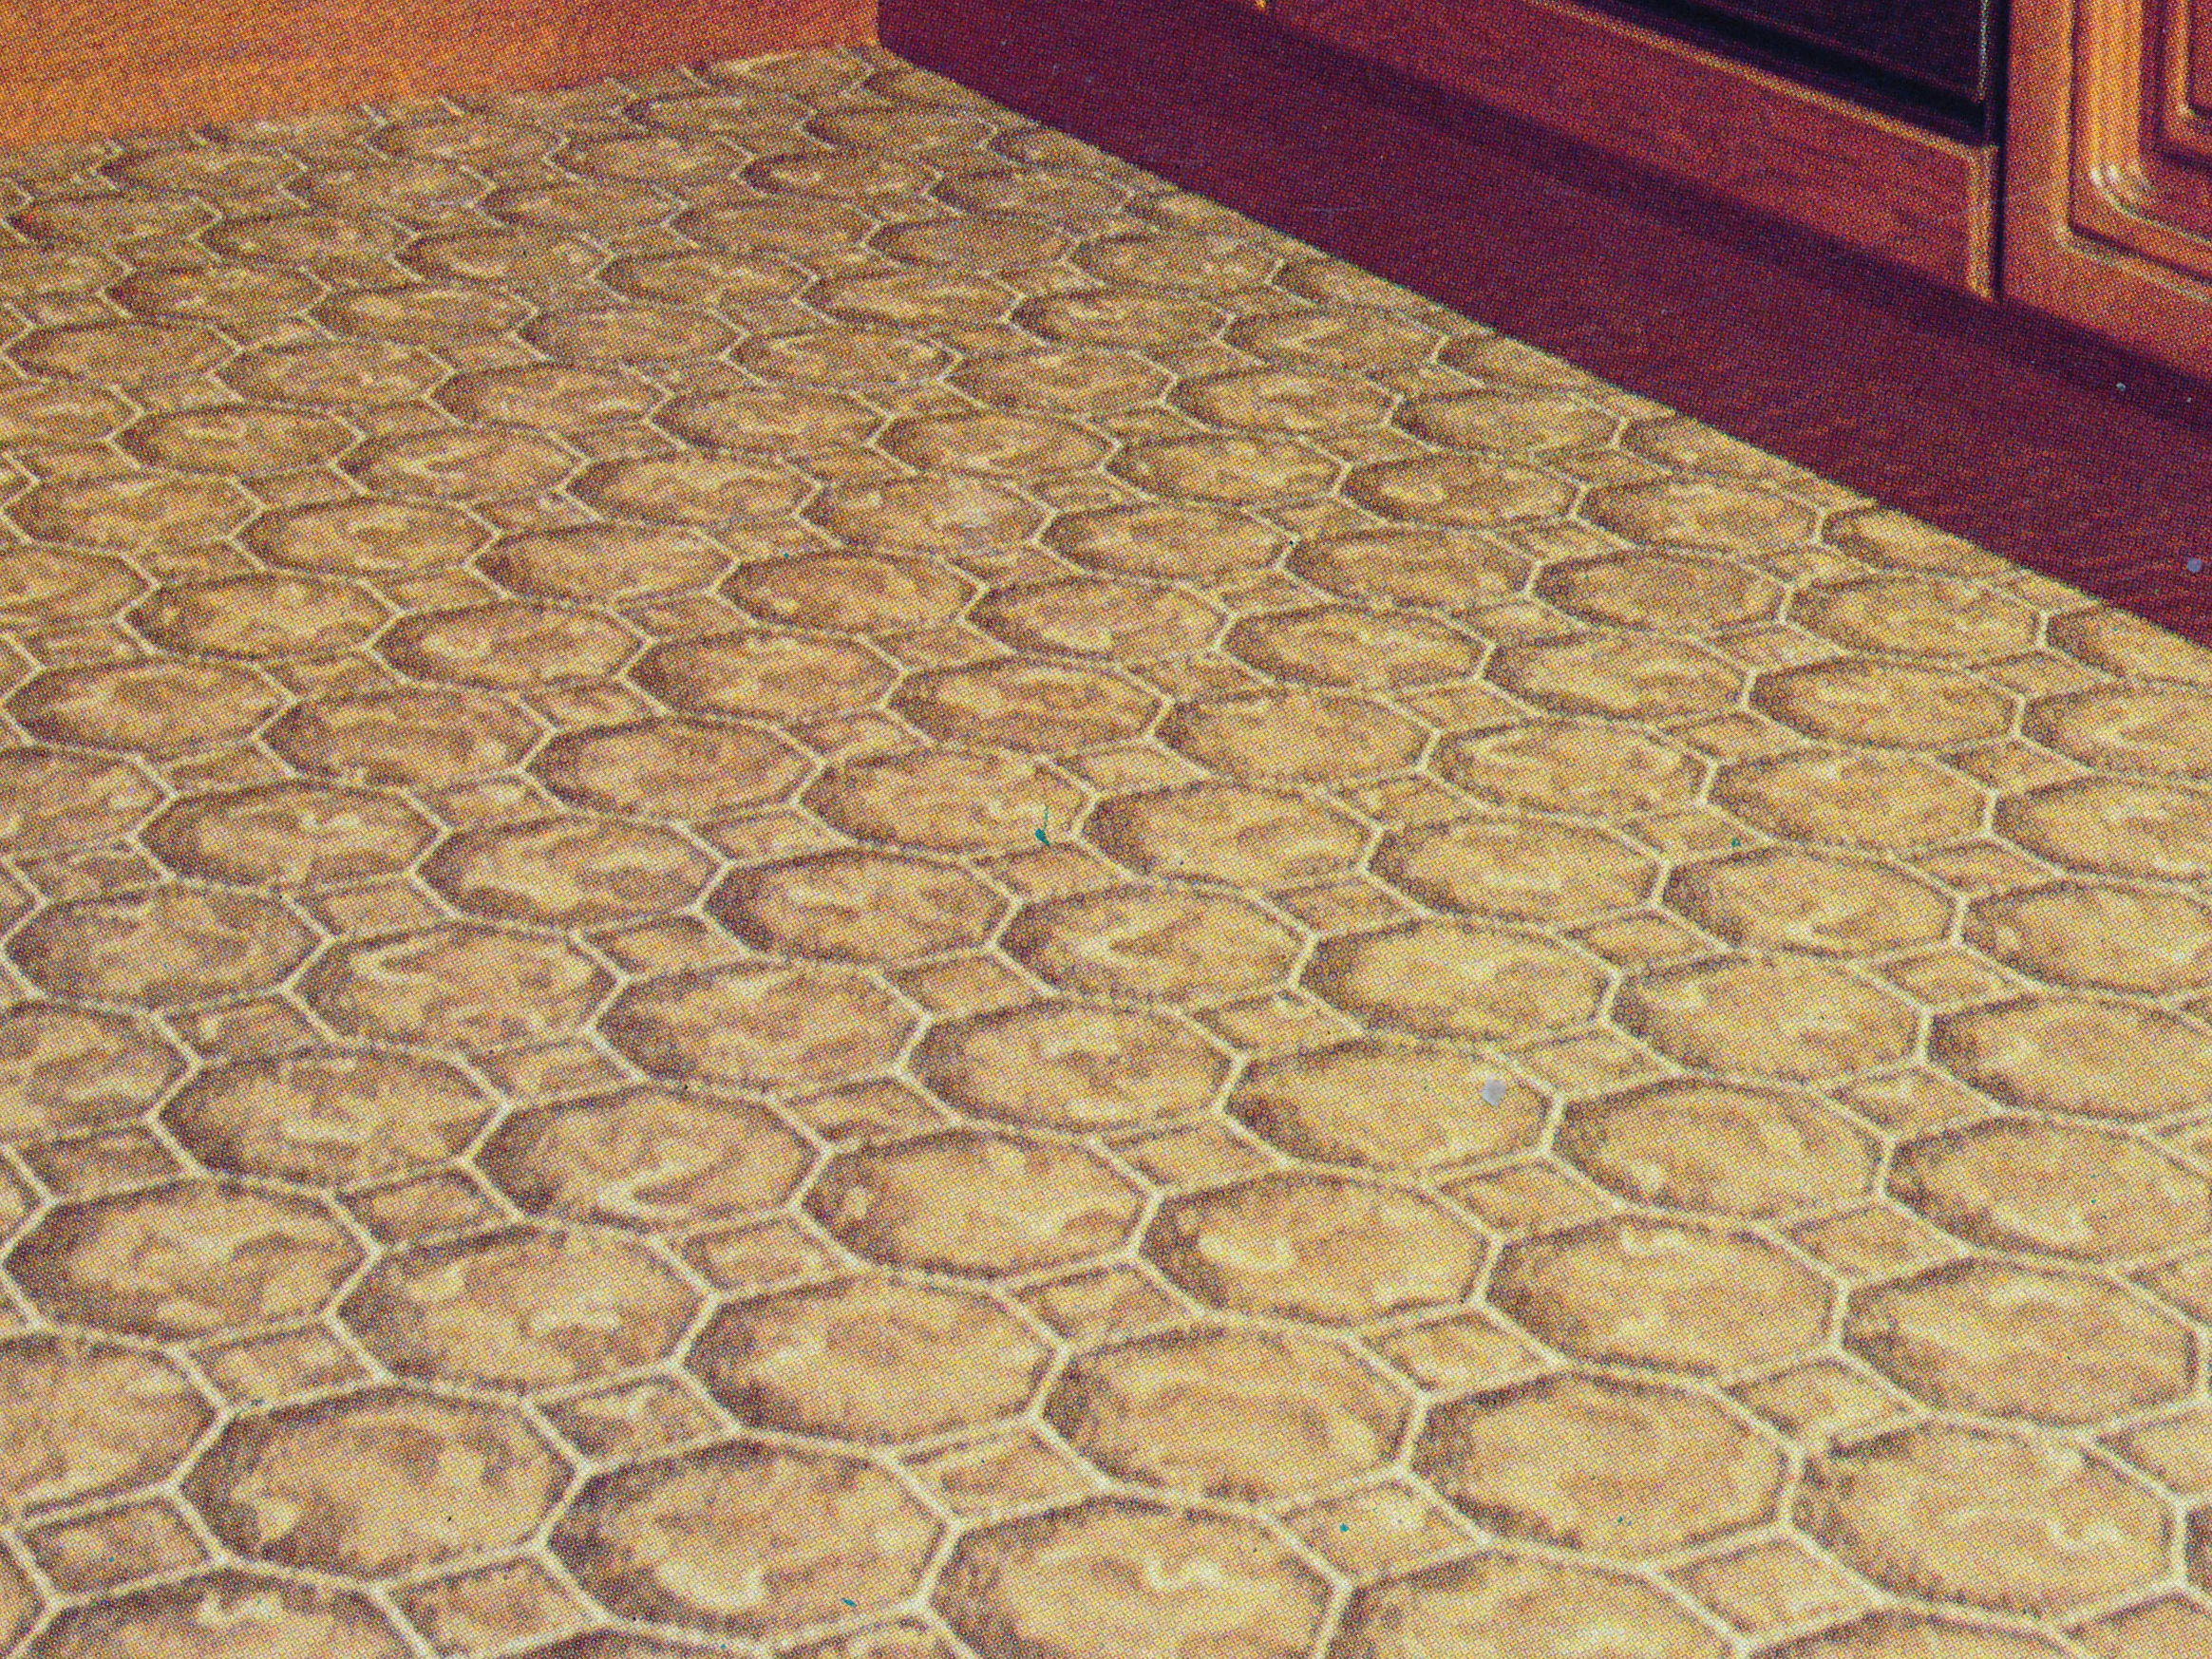 Resilient flooring toledo by tecnofloor industria chimica for Resilient flooring